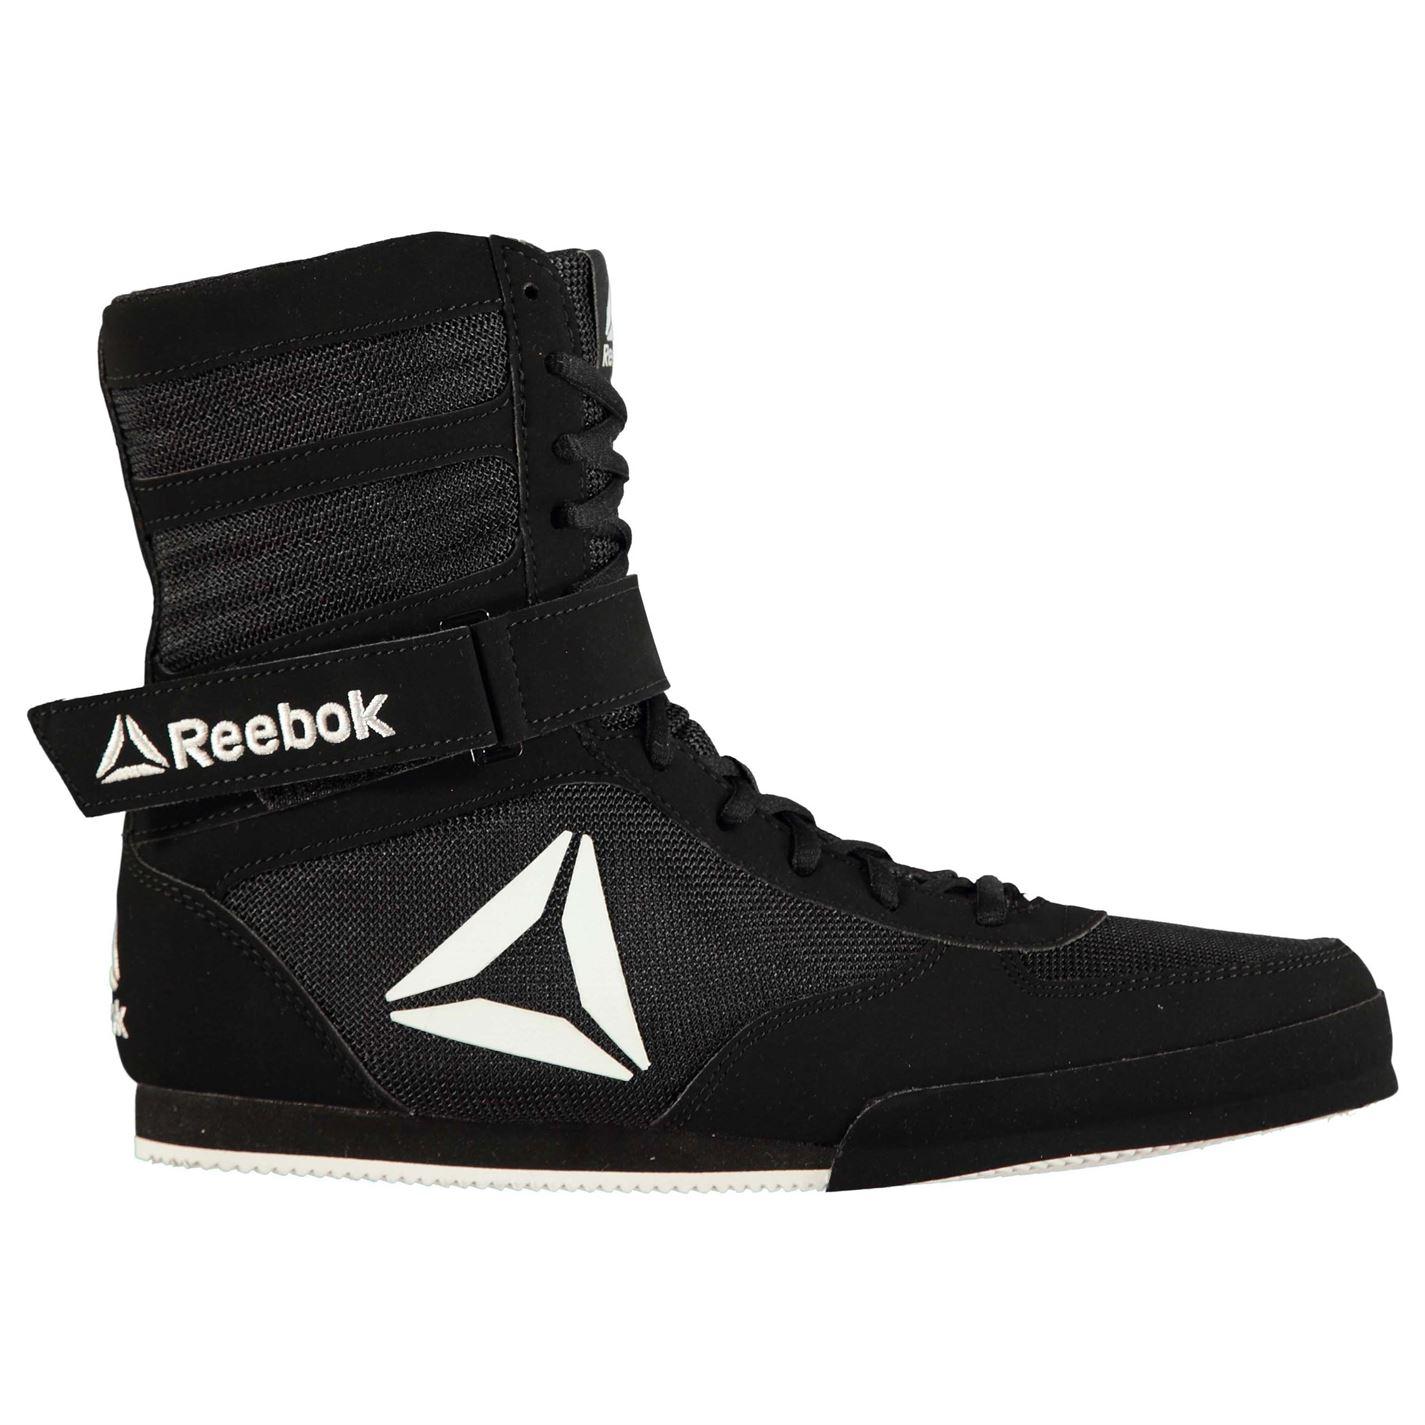 Lonsdale Tornado Mens Boxing Boots